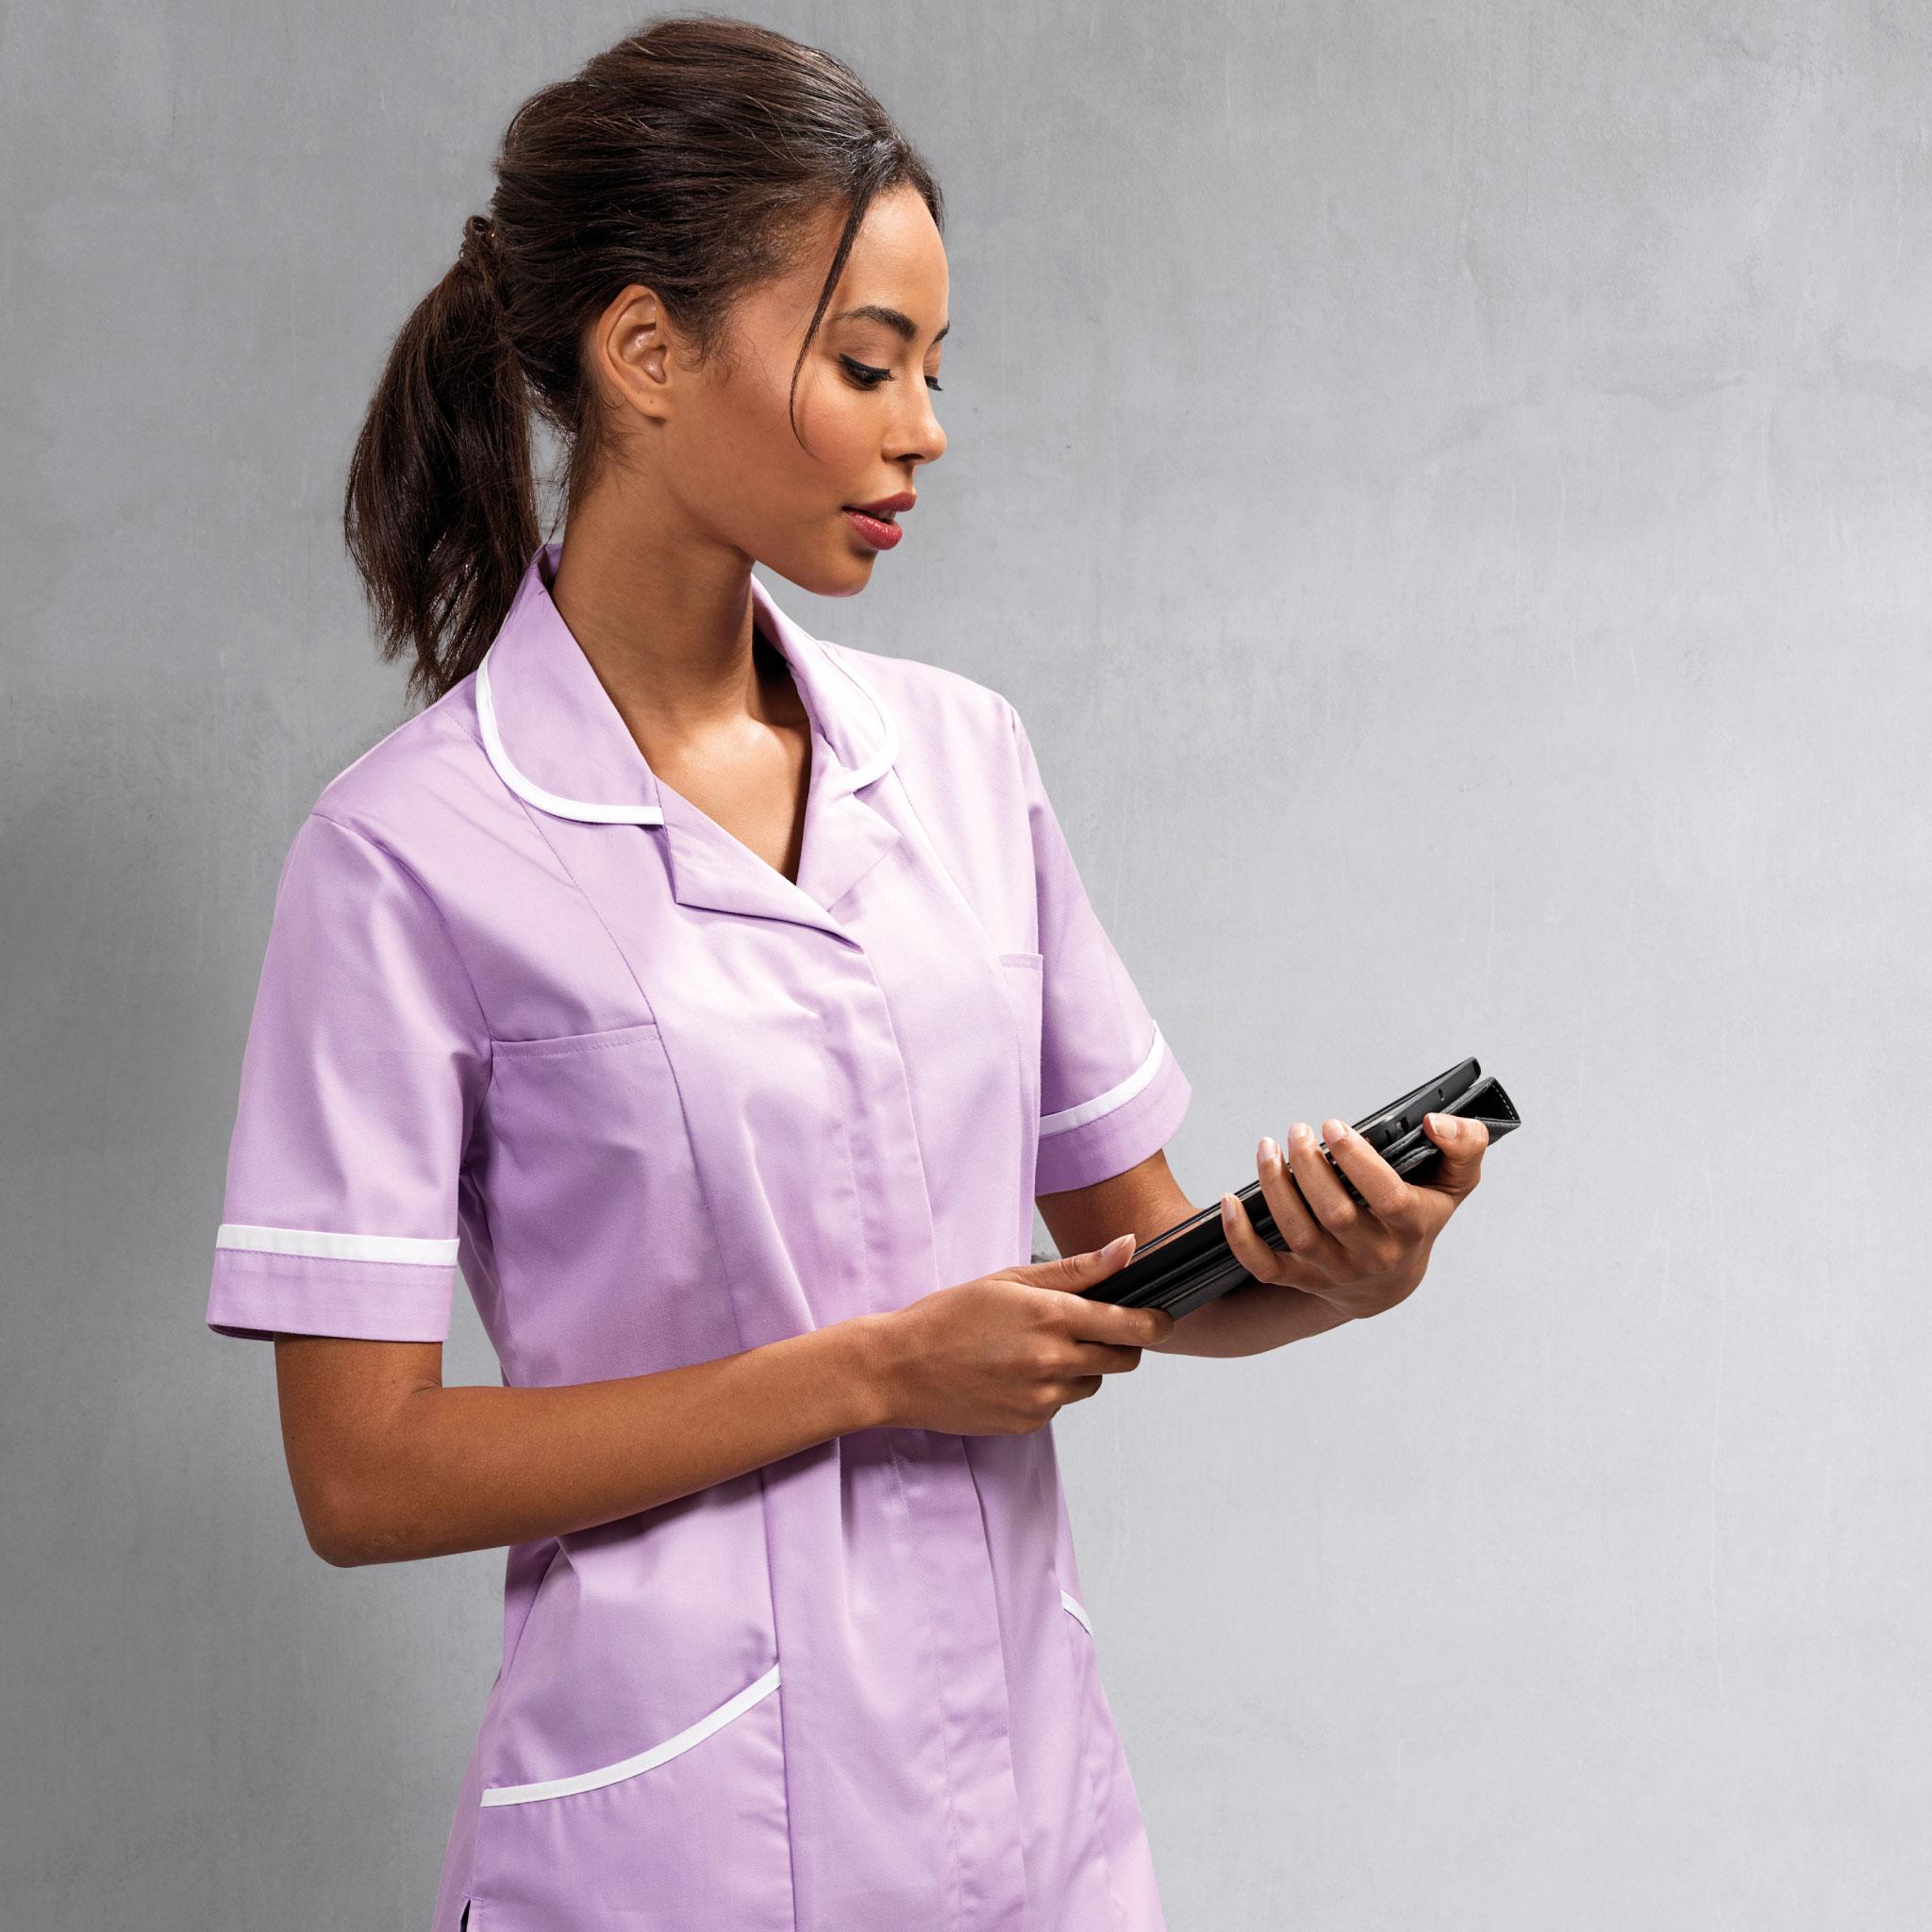 Nursing Workwear - Lady wearing A Nurse Scrubs Uniform